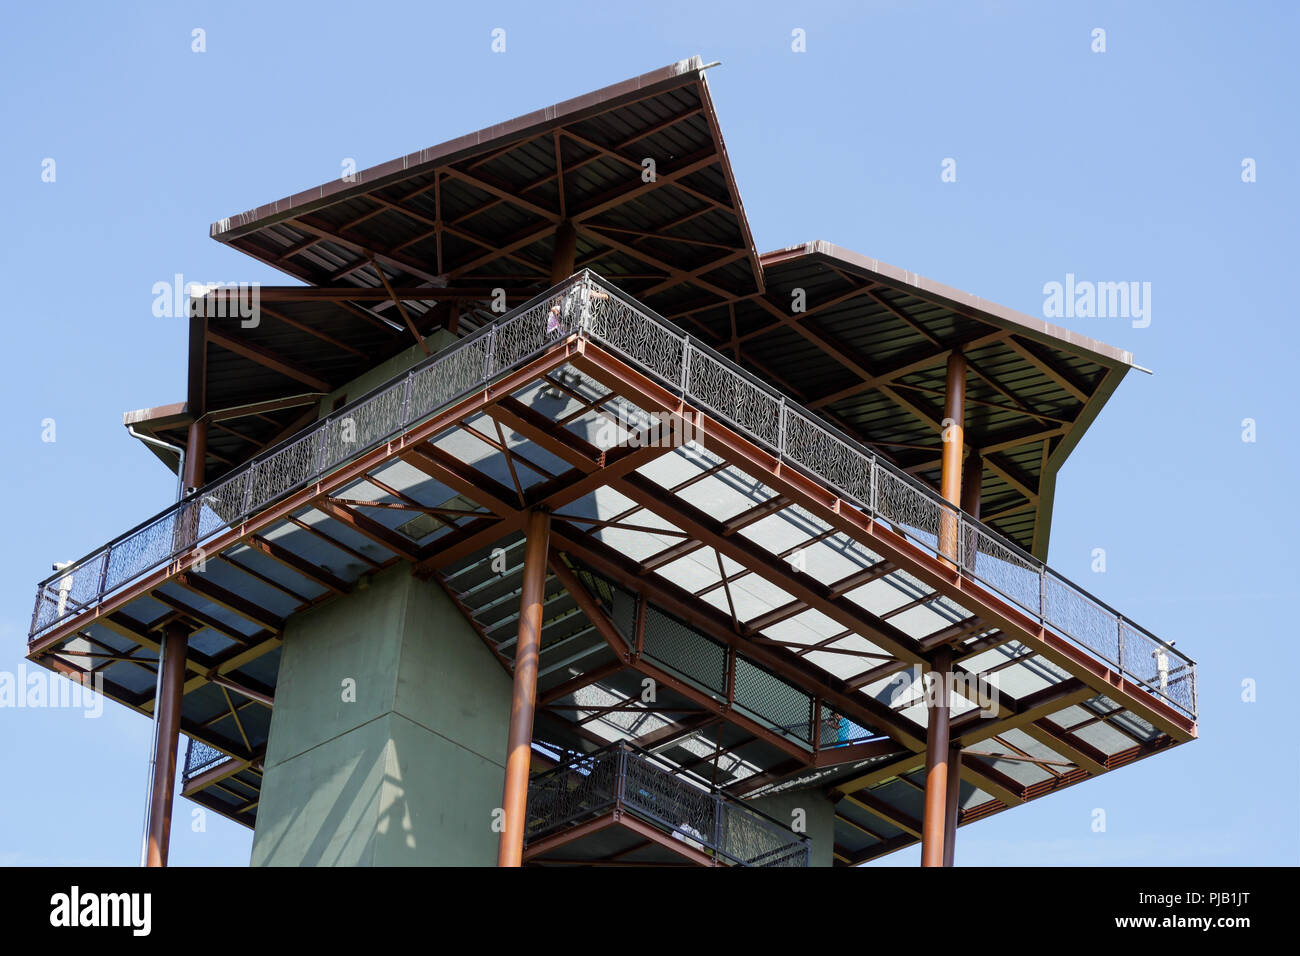 Watchtower, Birds Park, Villars Les Dombes, France - Stock Image